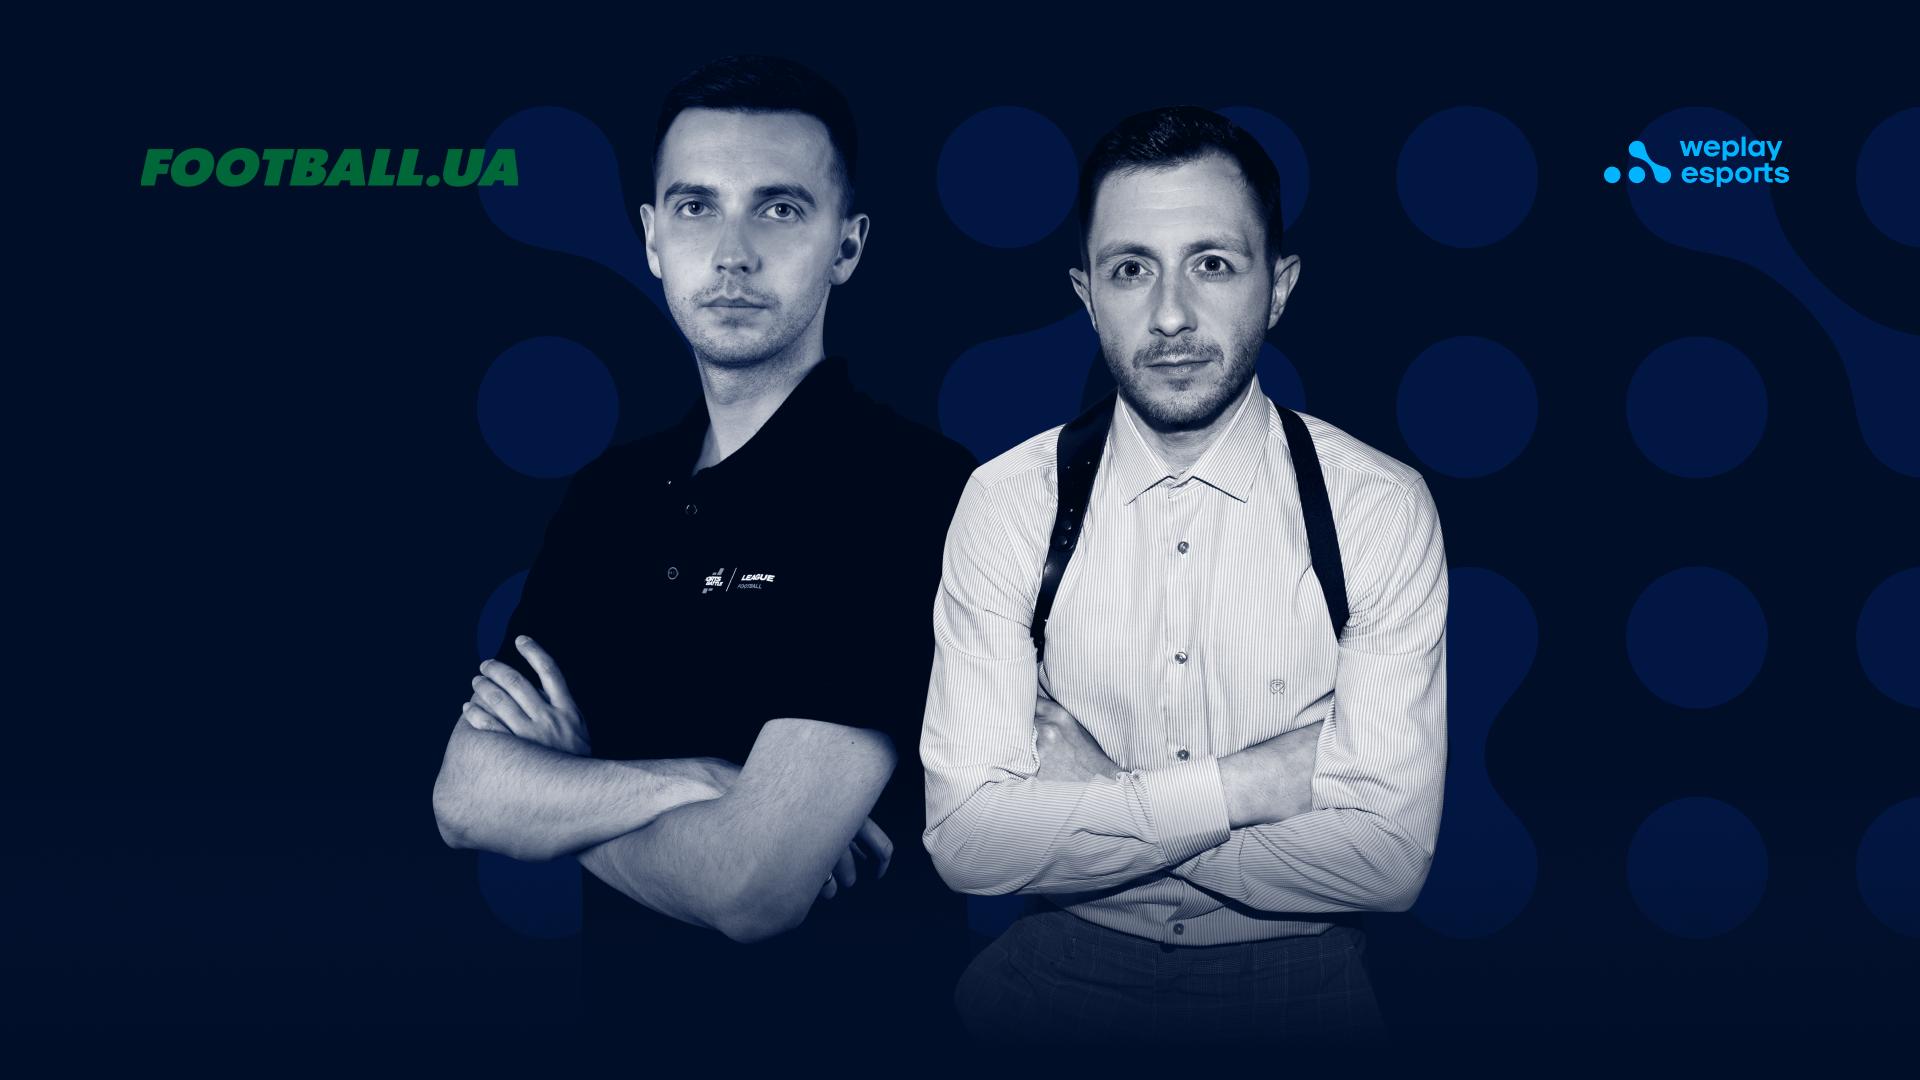 Евгений «Yozhyk» Мостовик и Юрий «Strike» Терещенко – комментаторы Cyber Cup FIFA 21. Изображение: WePlay Holding